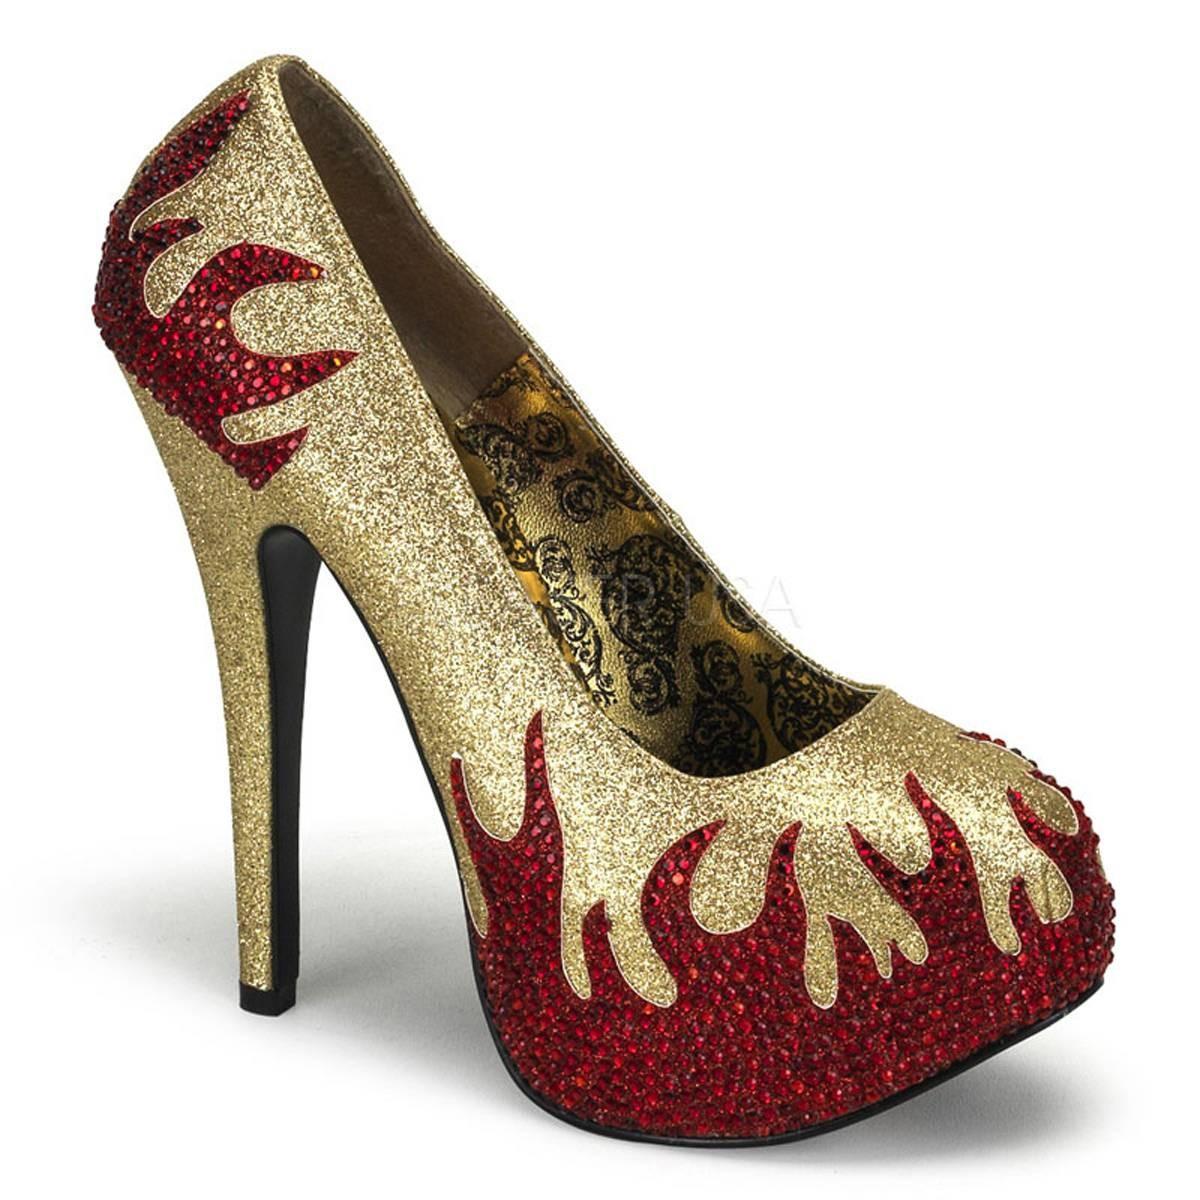 Highheels - TEEZE 27 ° Damen Pumps ° Gold Rot Glänzend ° Bordello  - Onlineshop RedSixty